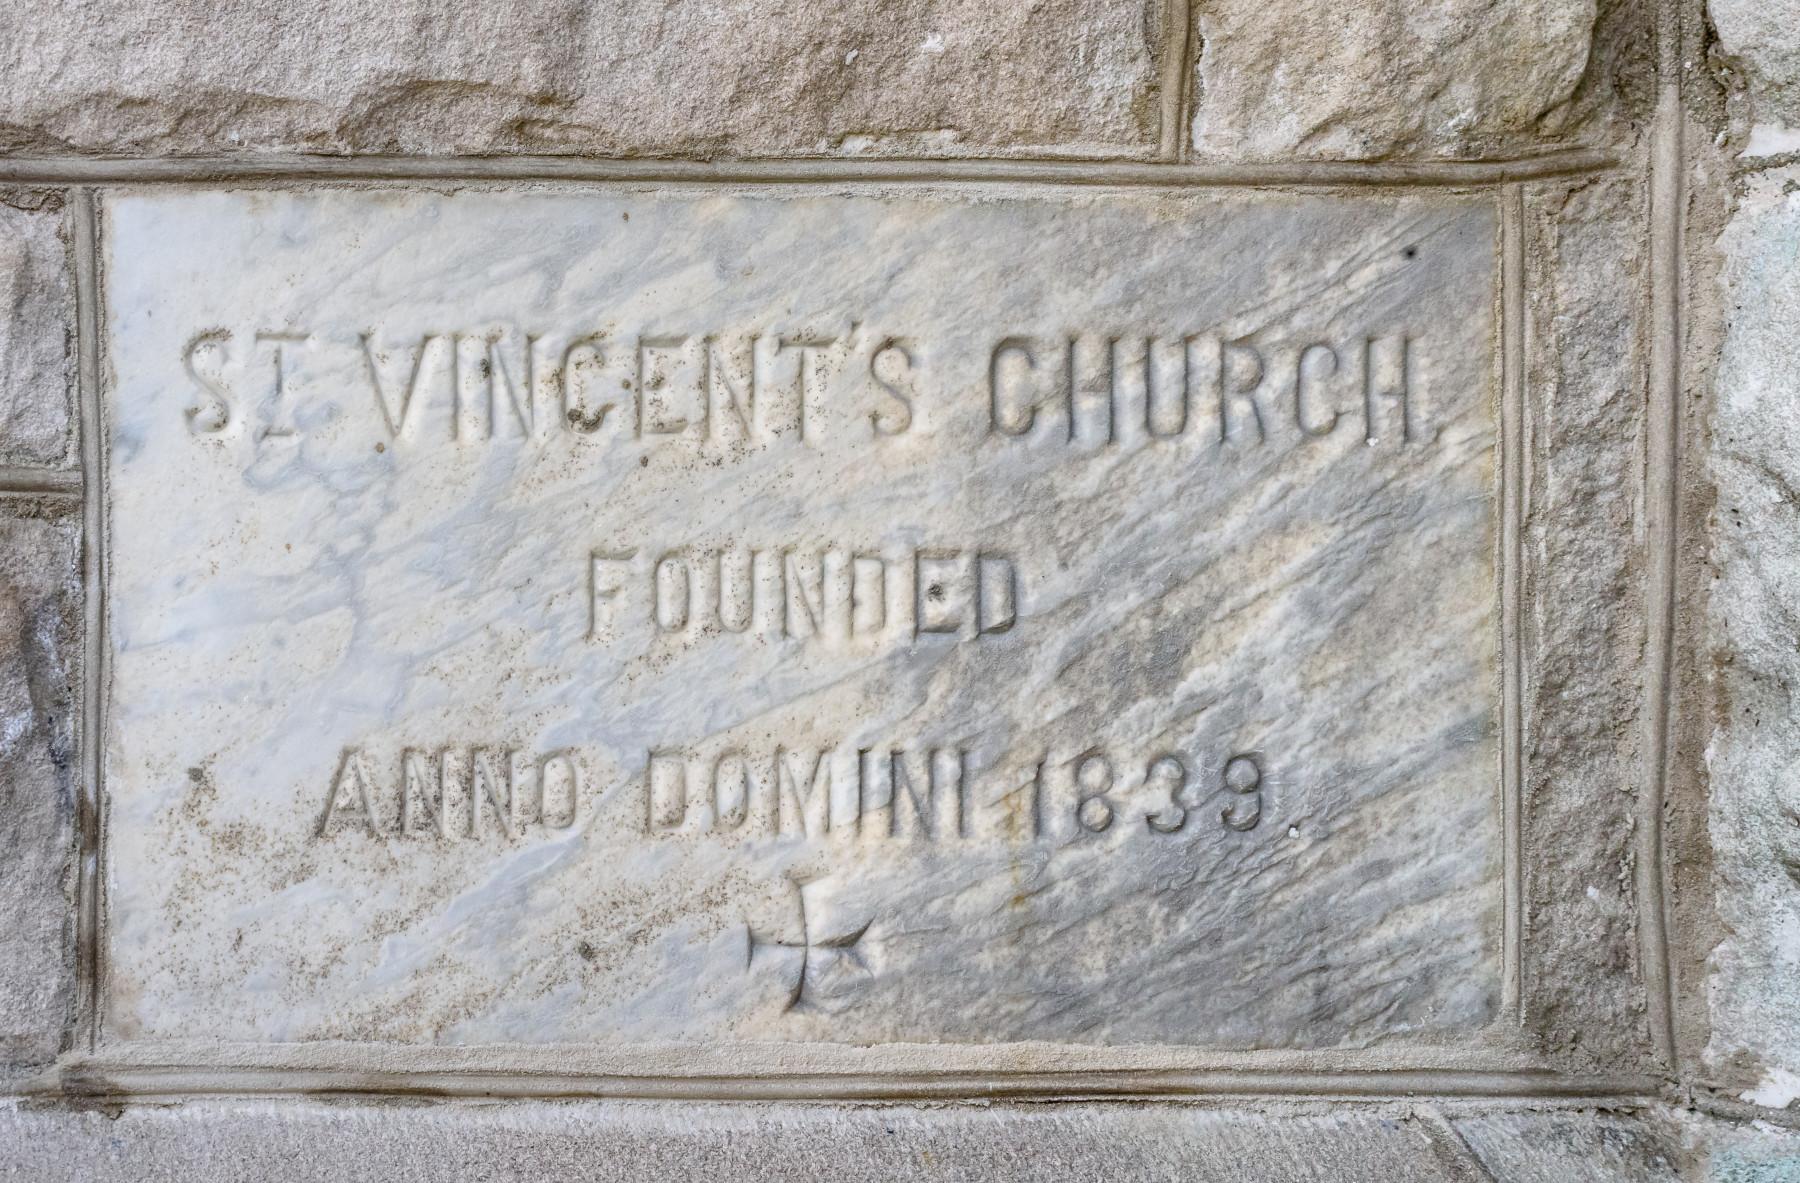 St. Vincent's Madison NJ founded 1839